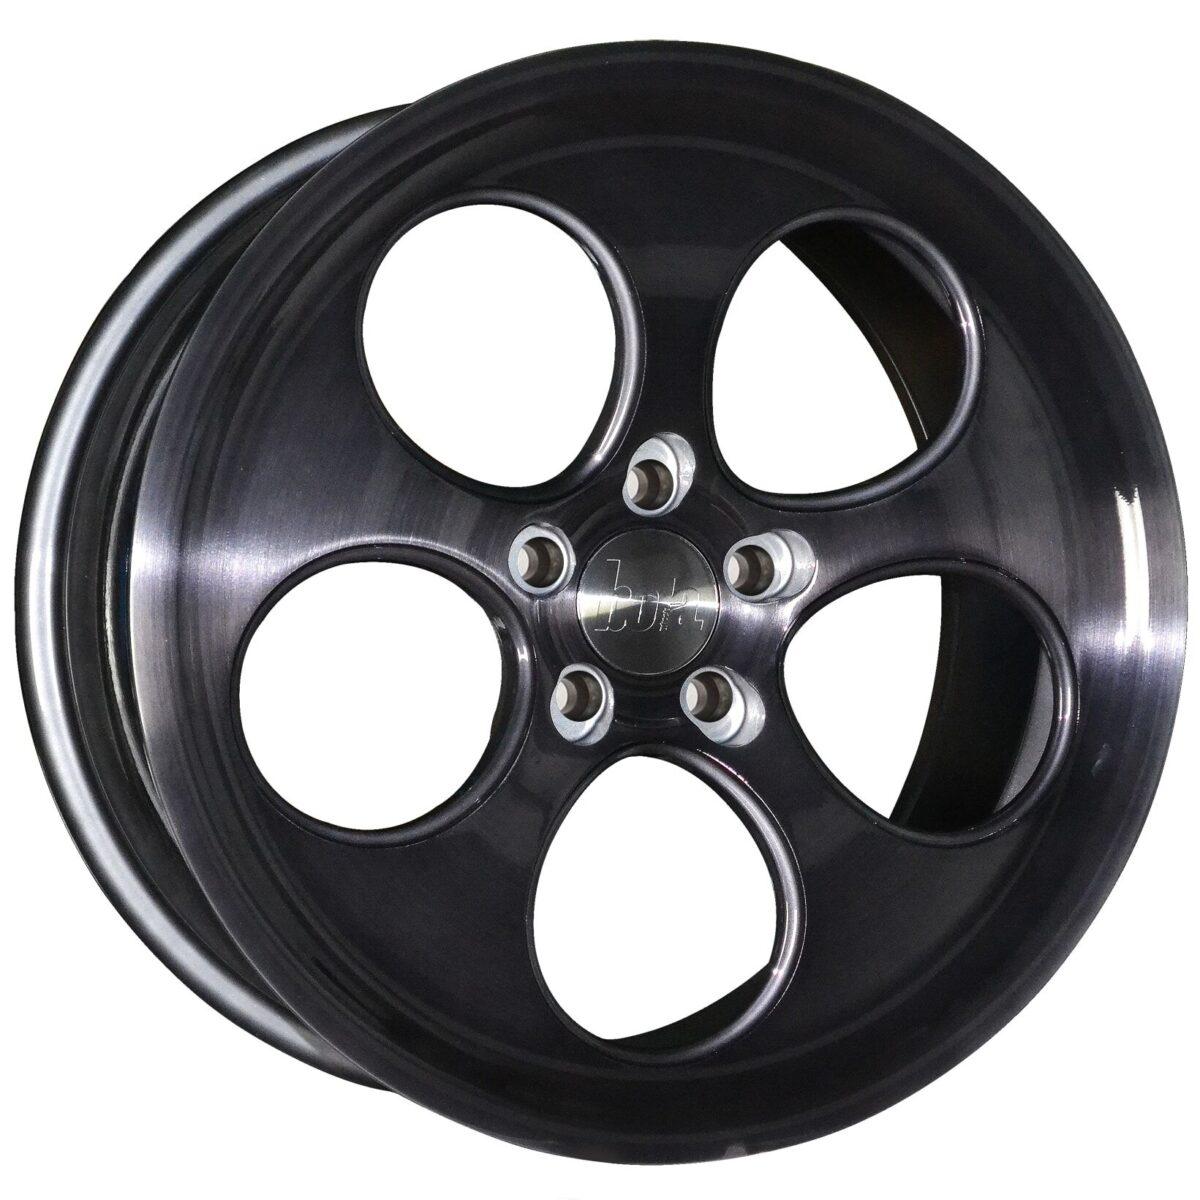 "18"" BOLA B5 Wheels - Black Brushed Polished Face - All BMW Models"